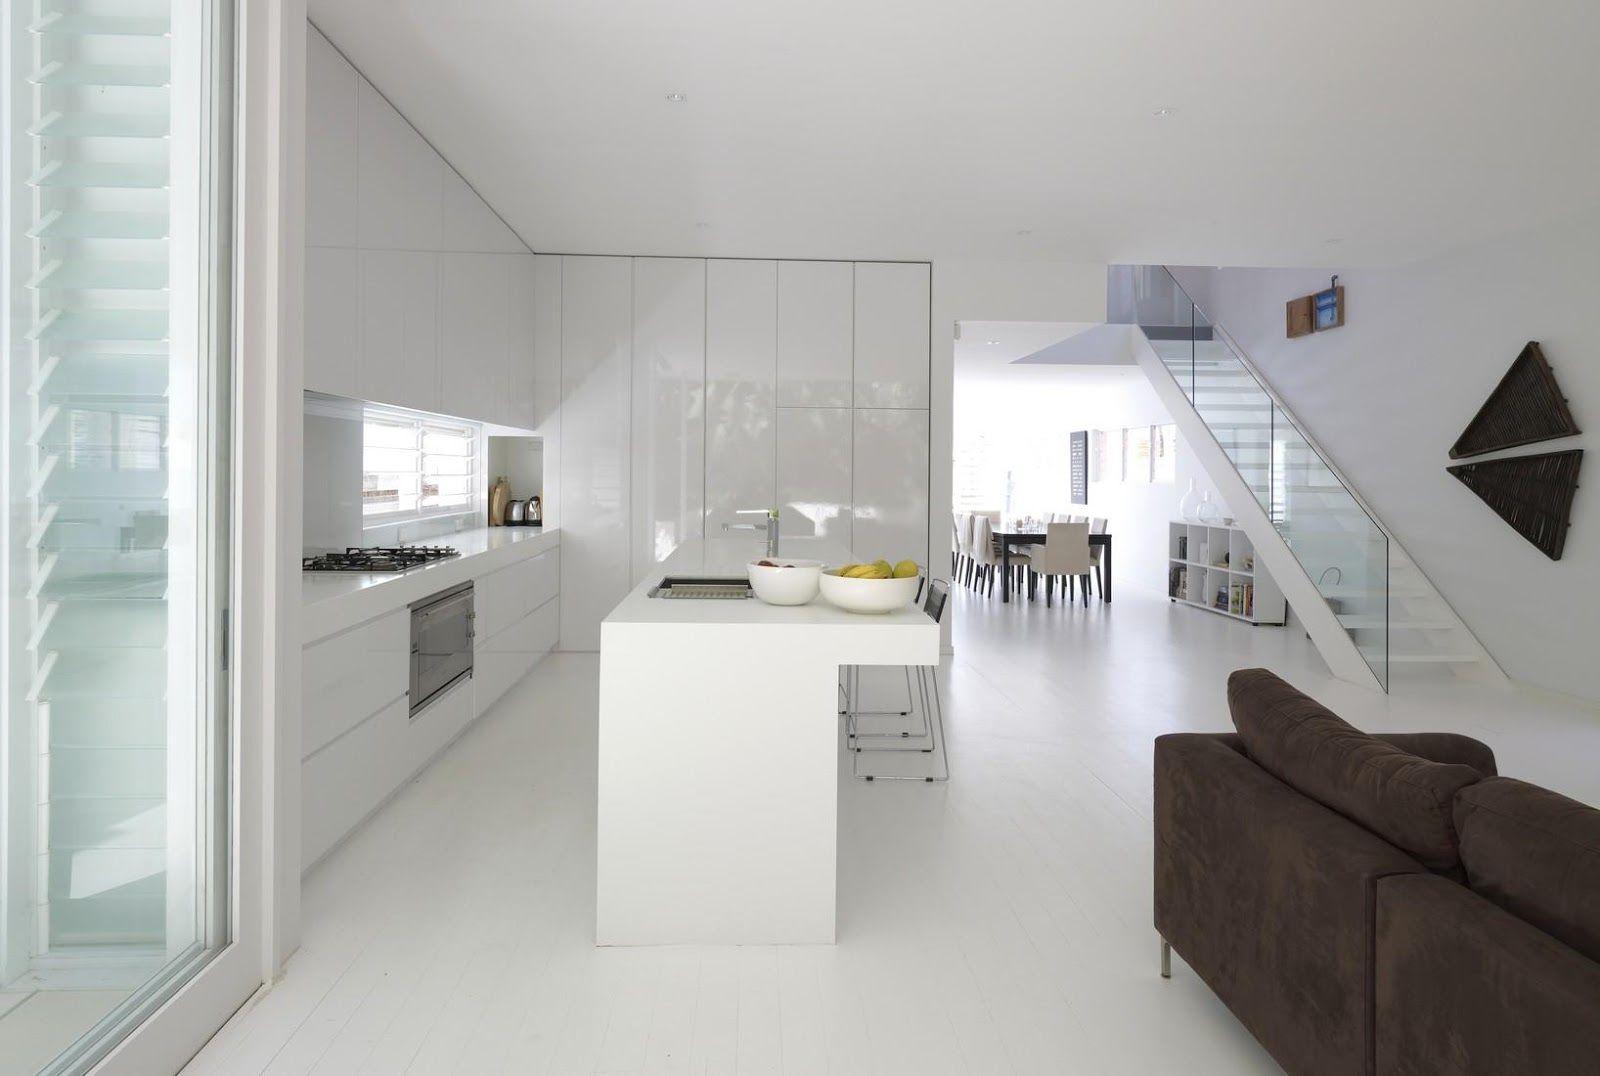 CG Interior, Designed by Tony Owen Architects | CG : Interior ...